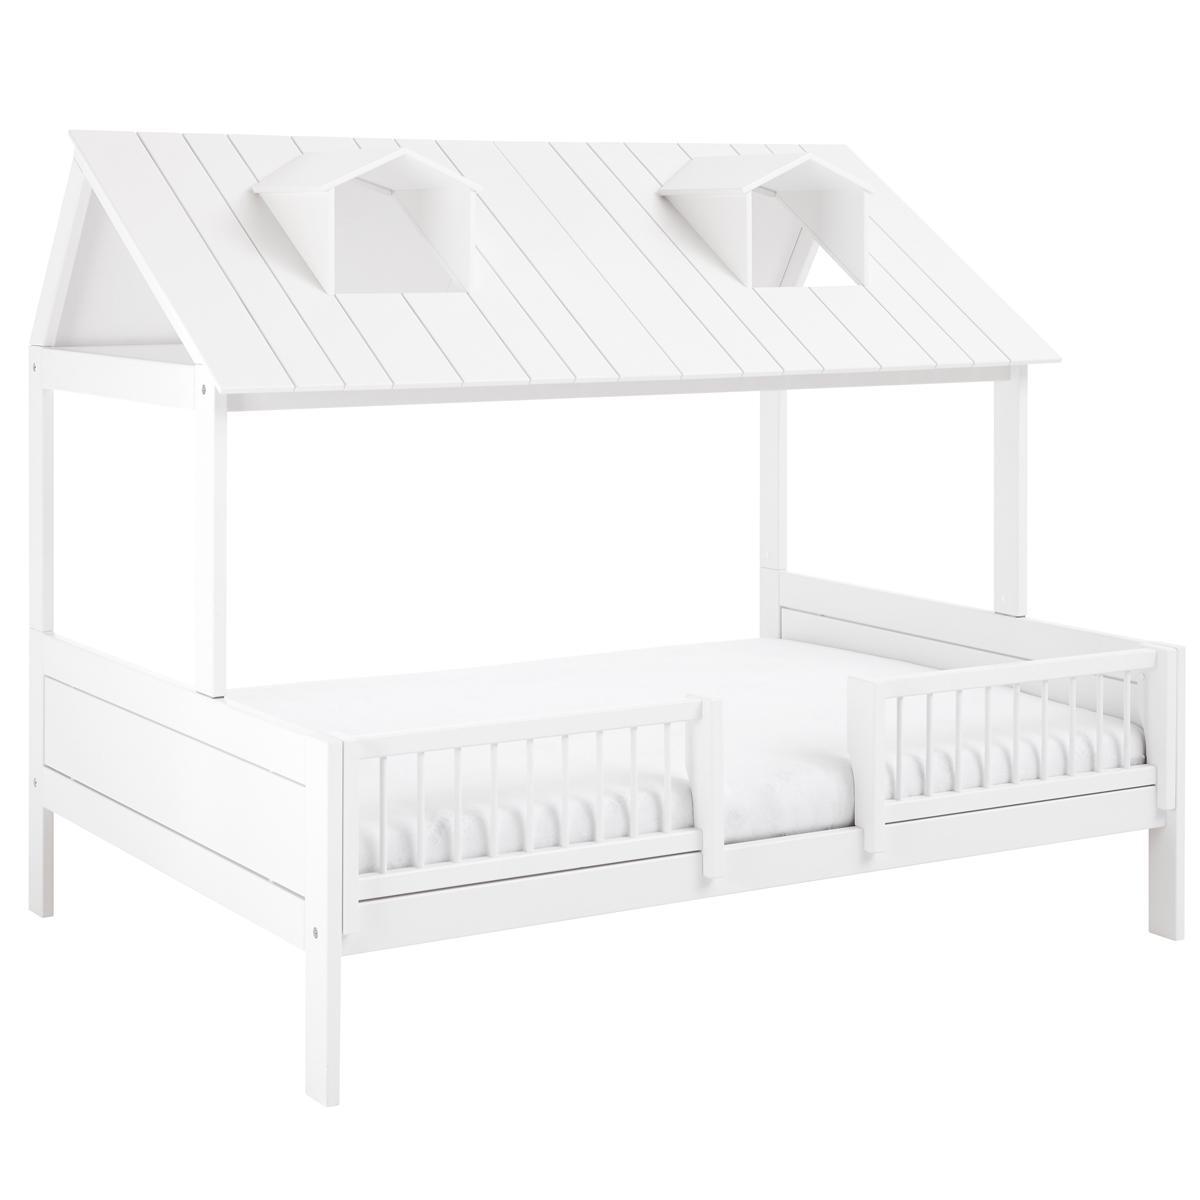 Lit 140x200cm-sommier luxe BEACH HOUSE  Lifetime blanc